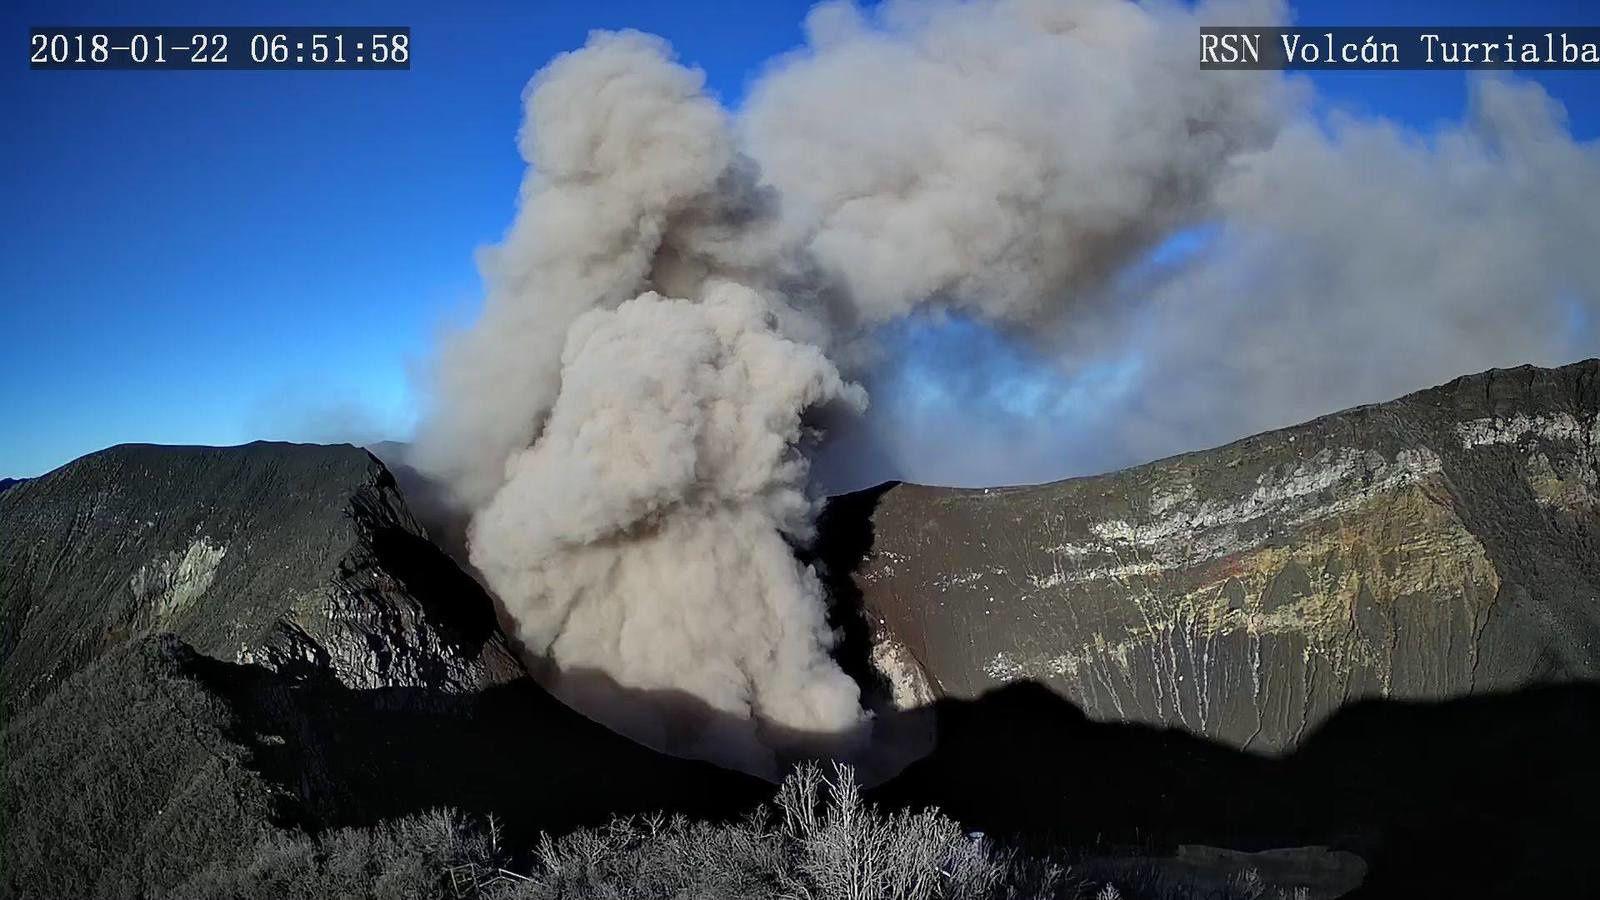 Turrialba - 22.01.2018 / 6h51 - webcam RSN